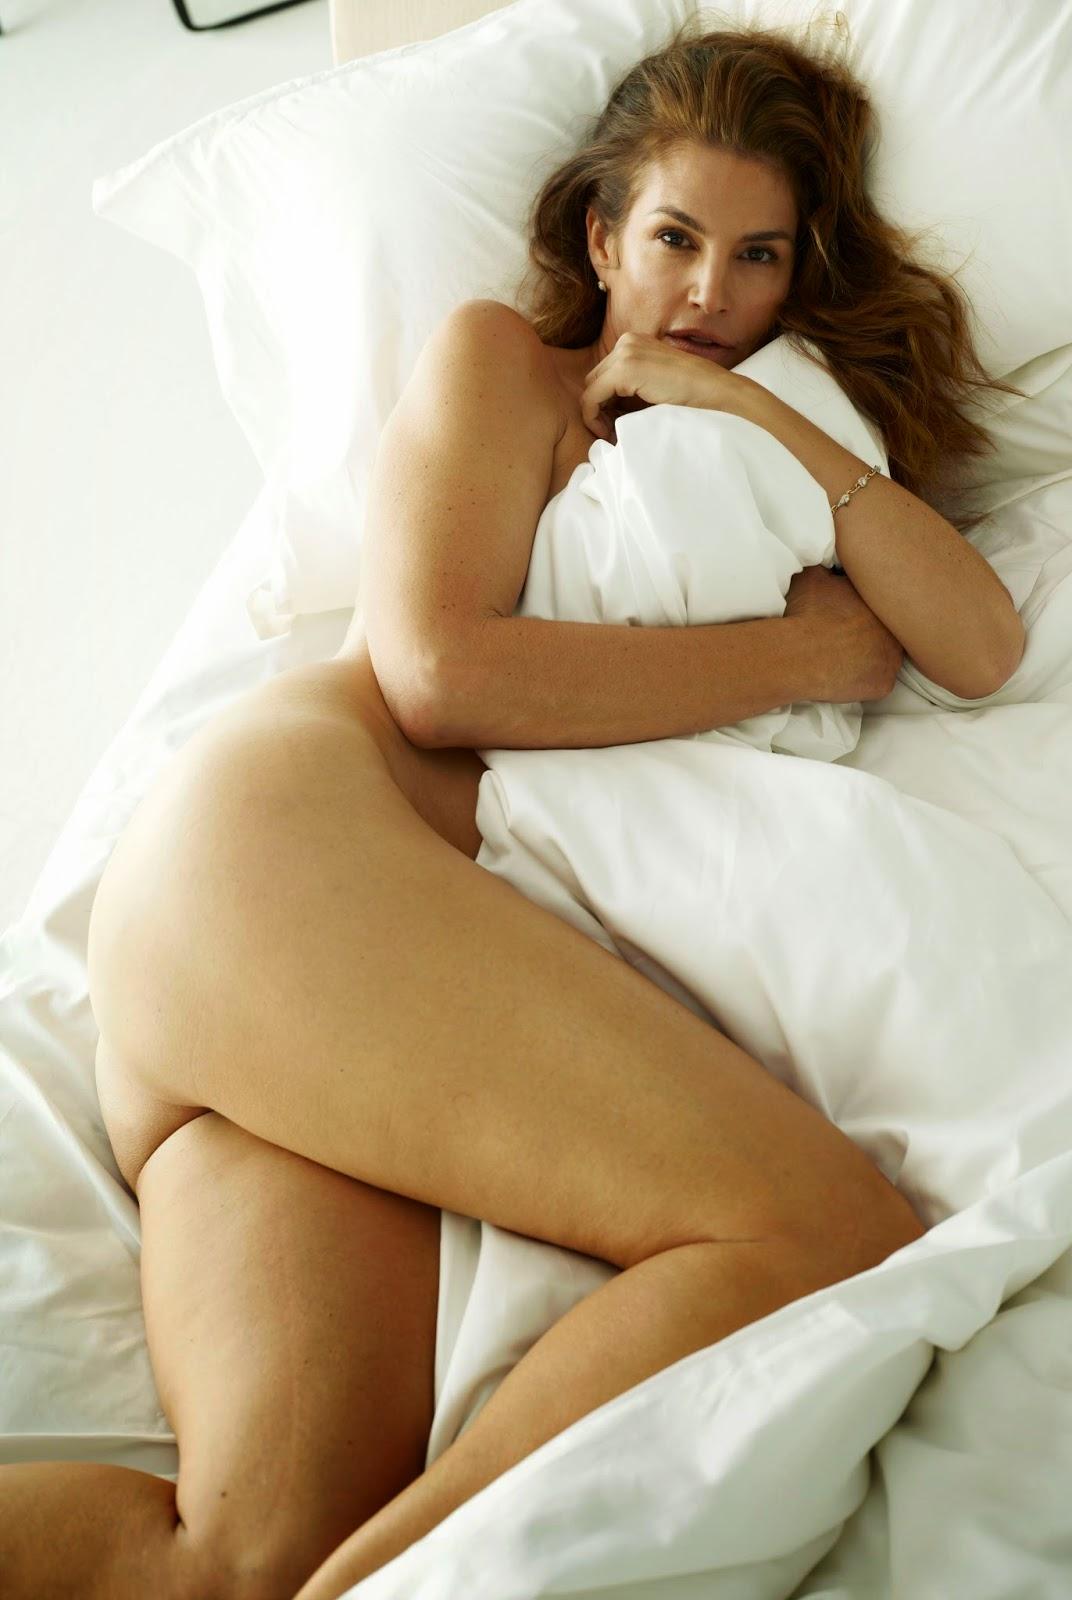 cindy crawford naked photo